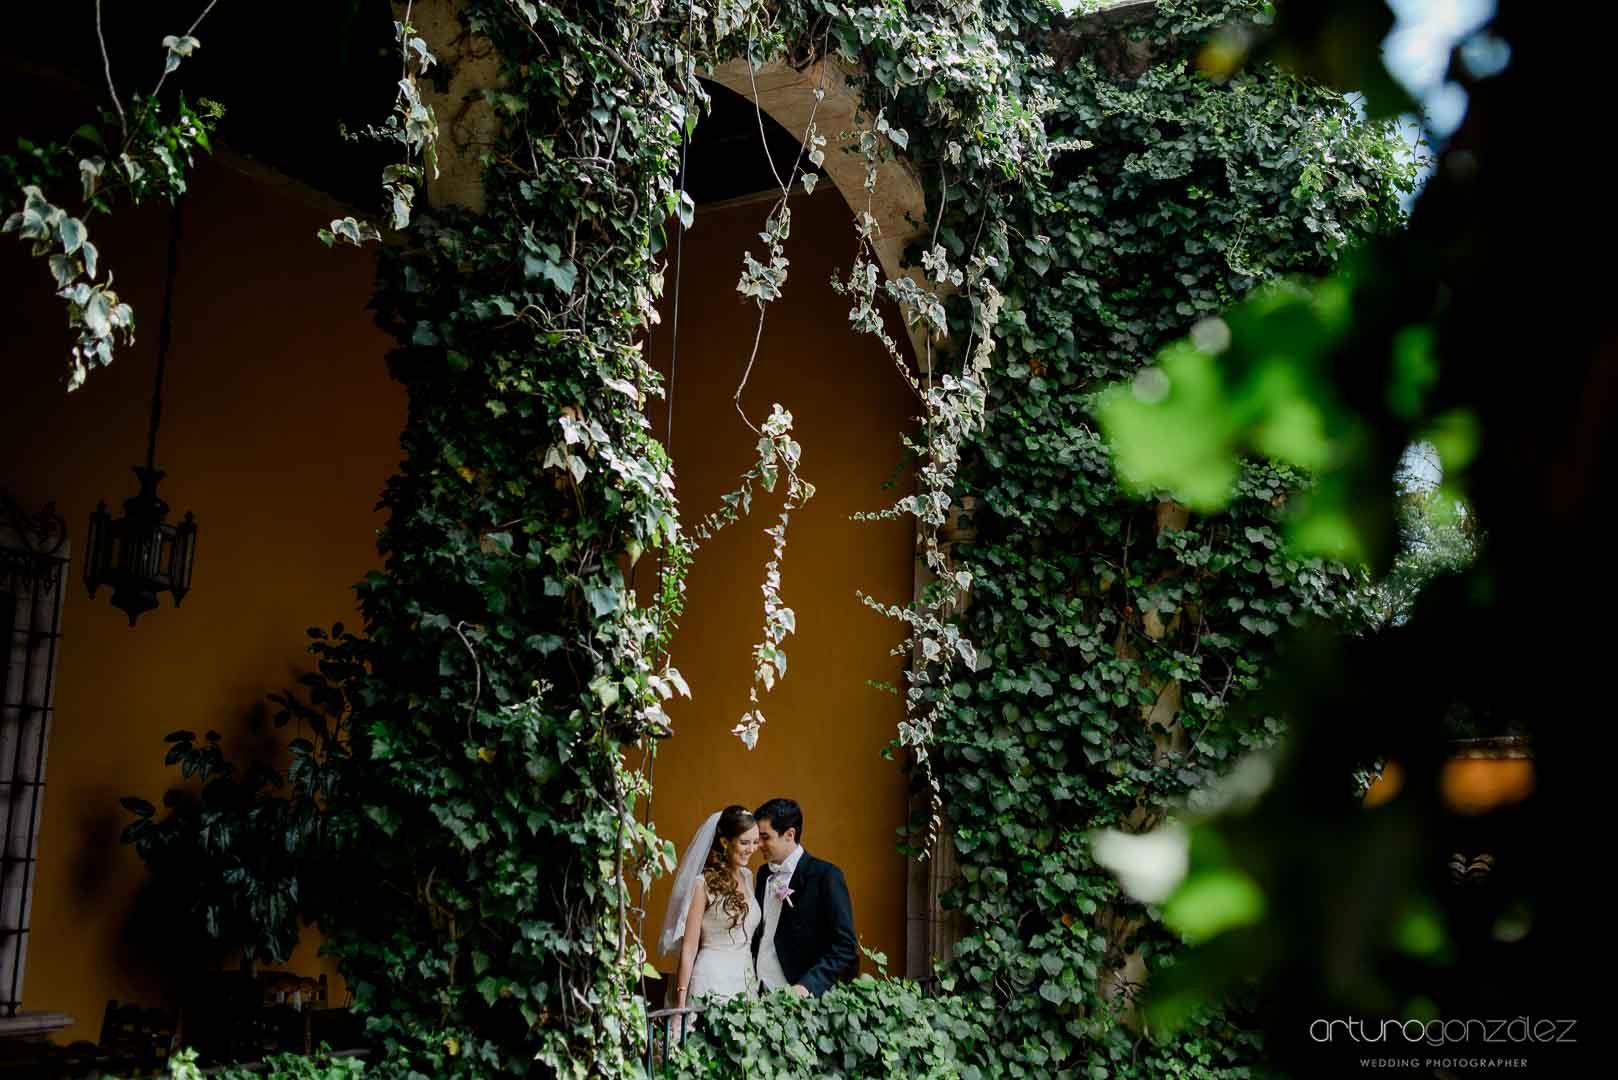 fotografo-de-bodas-en-guanajuato-37